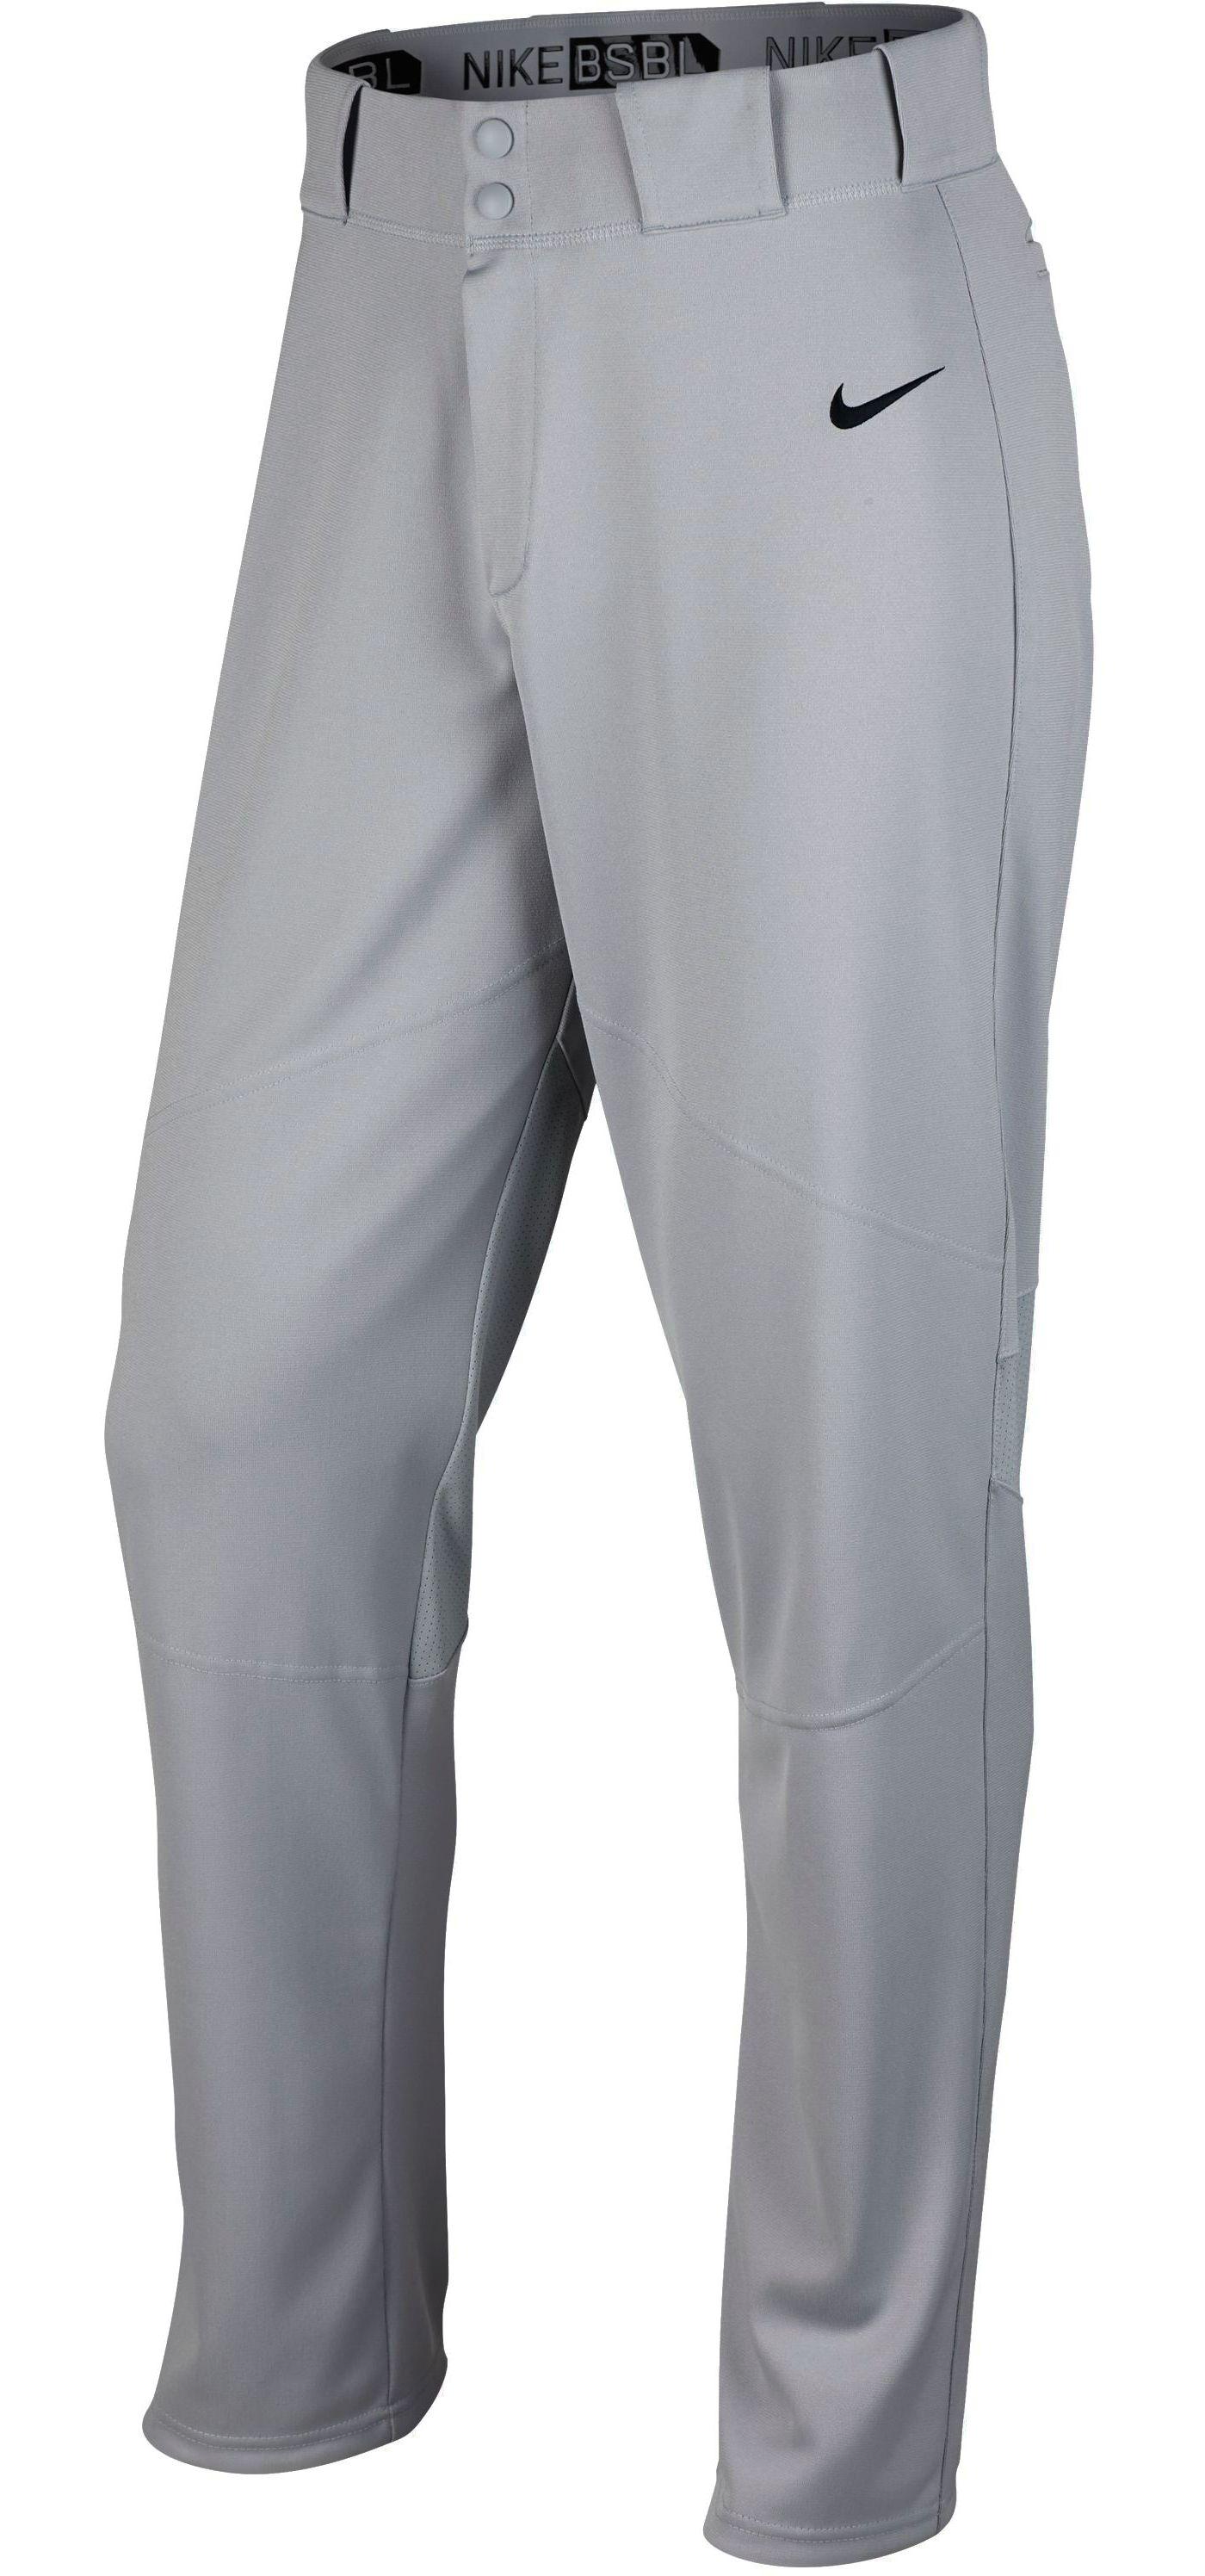 Nike Men's Pro Vapor Baseball Pants